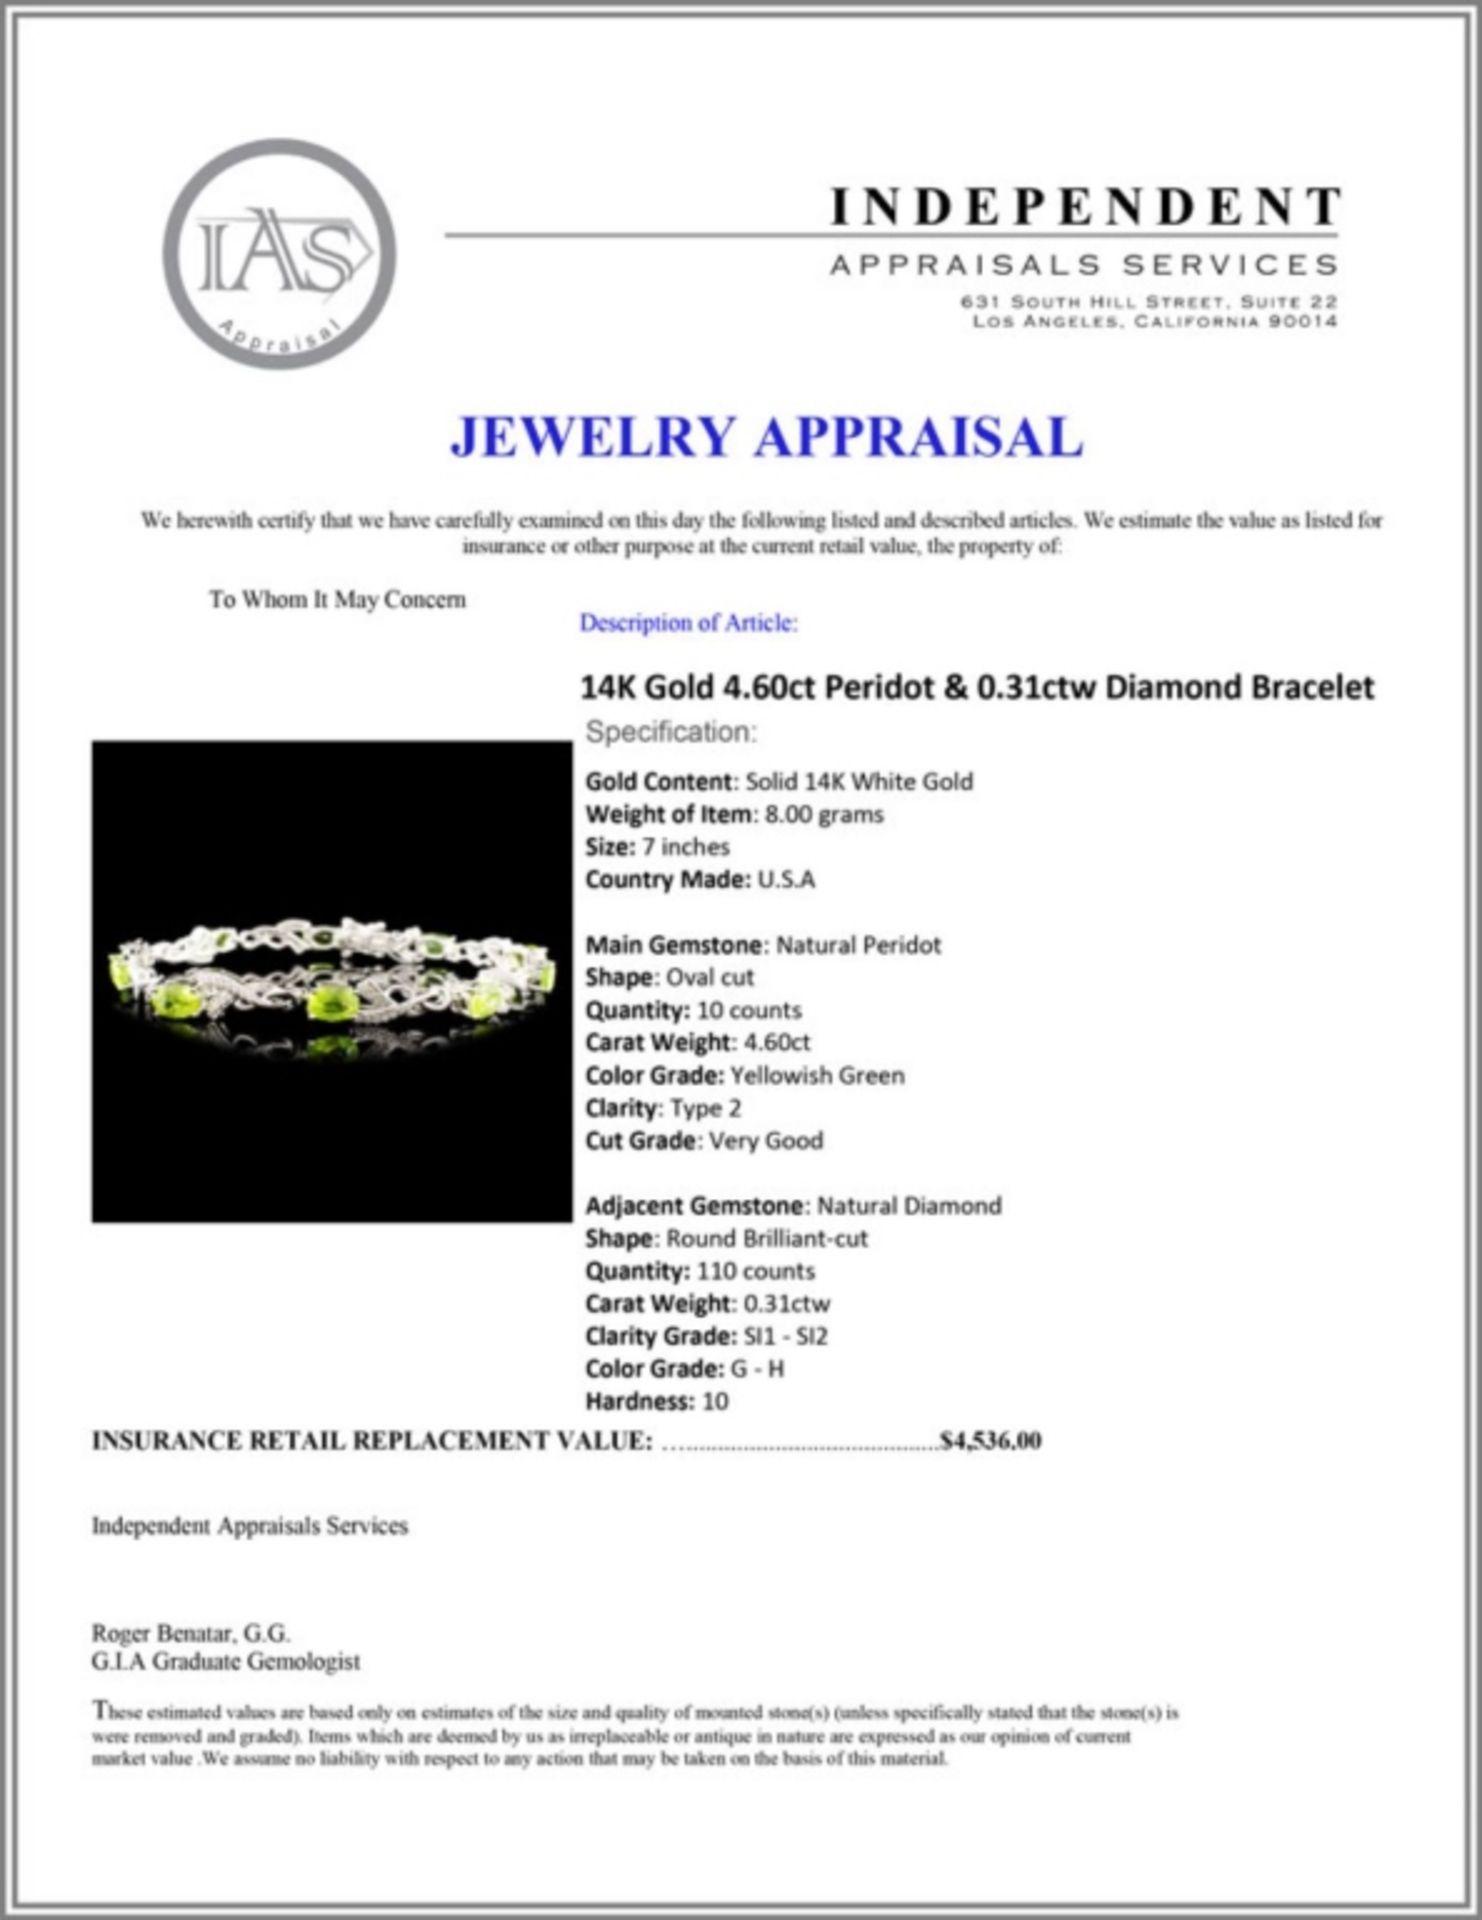 14K Gold 4.60ct Peridot & 0.31ctw Diamond Bracelet - Image 4 of 4